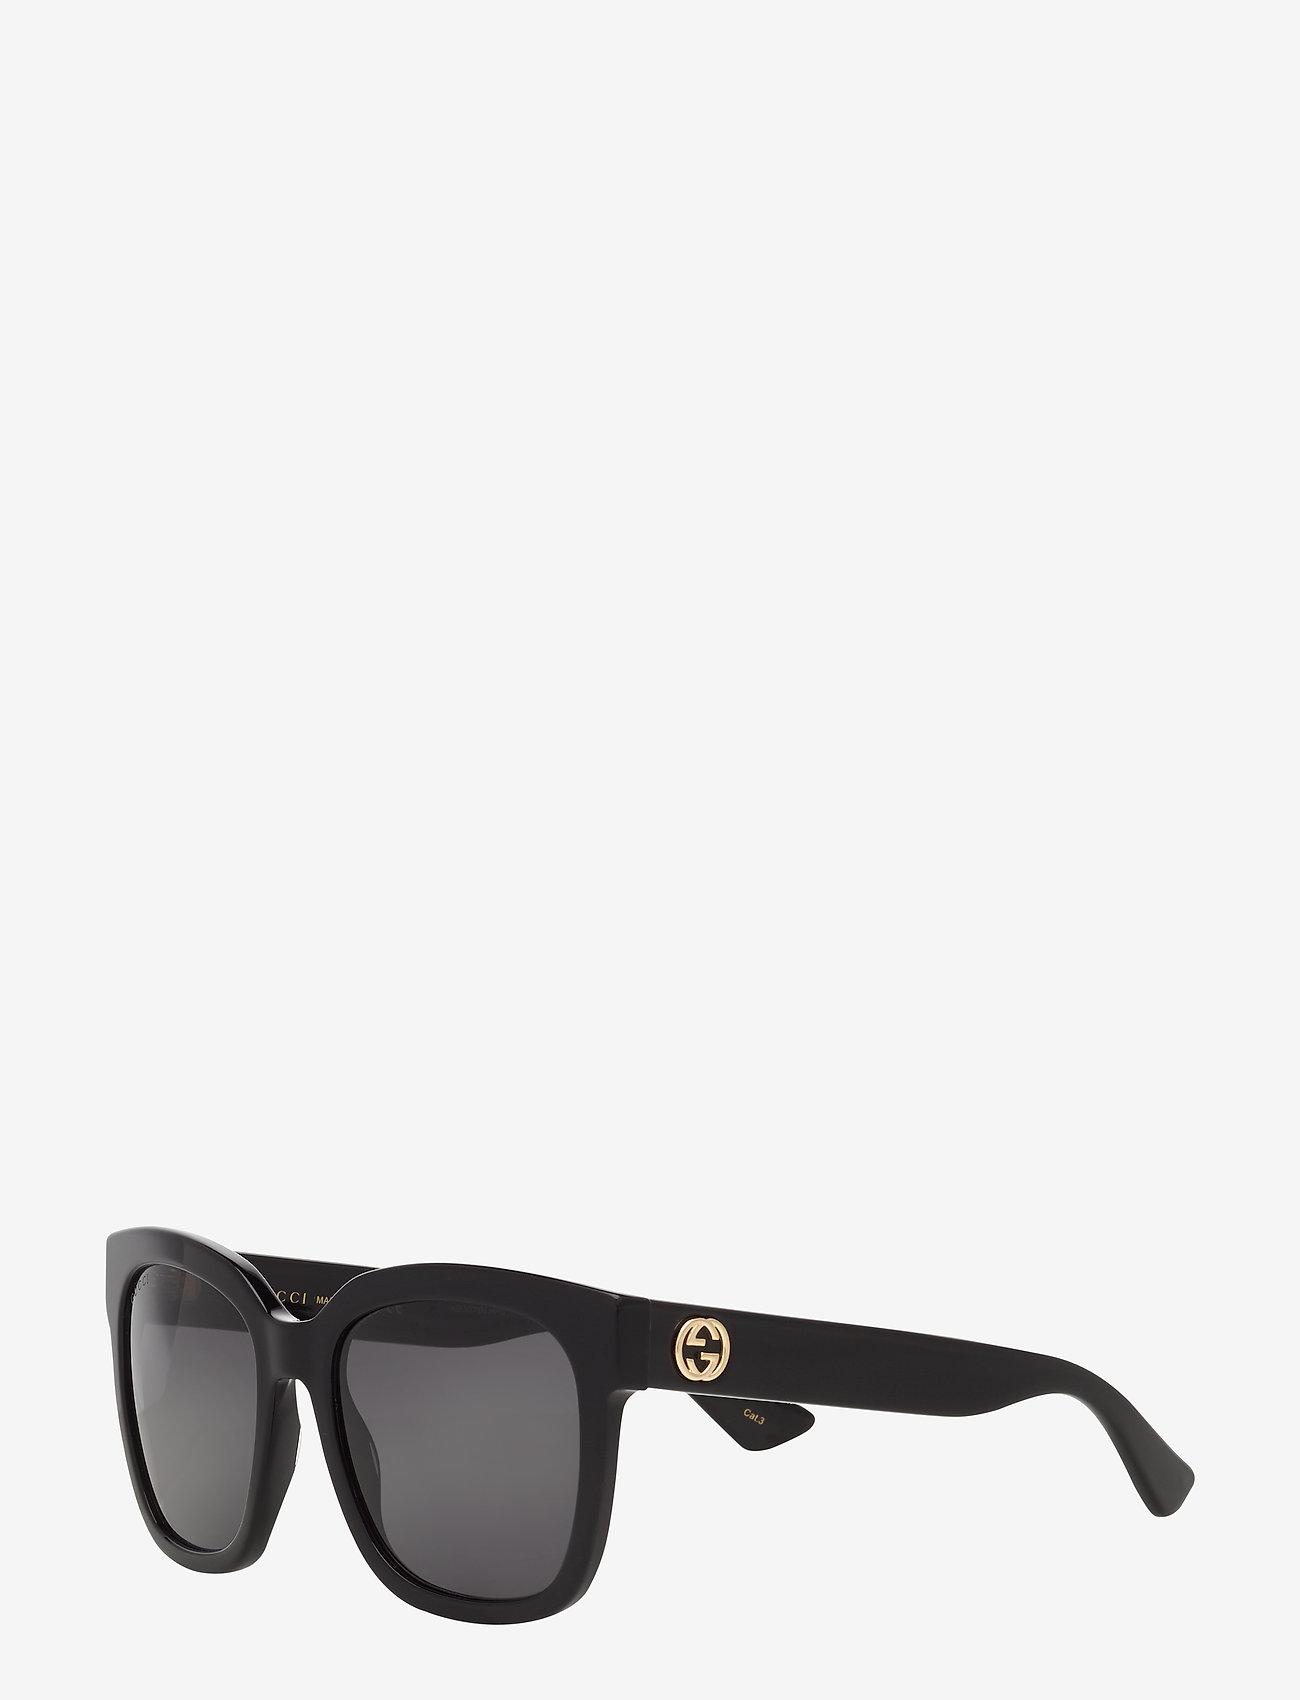 Gucci Sunglasses - GG0034S - d-muotoiset - black-black-grey - 1